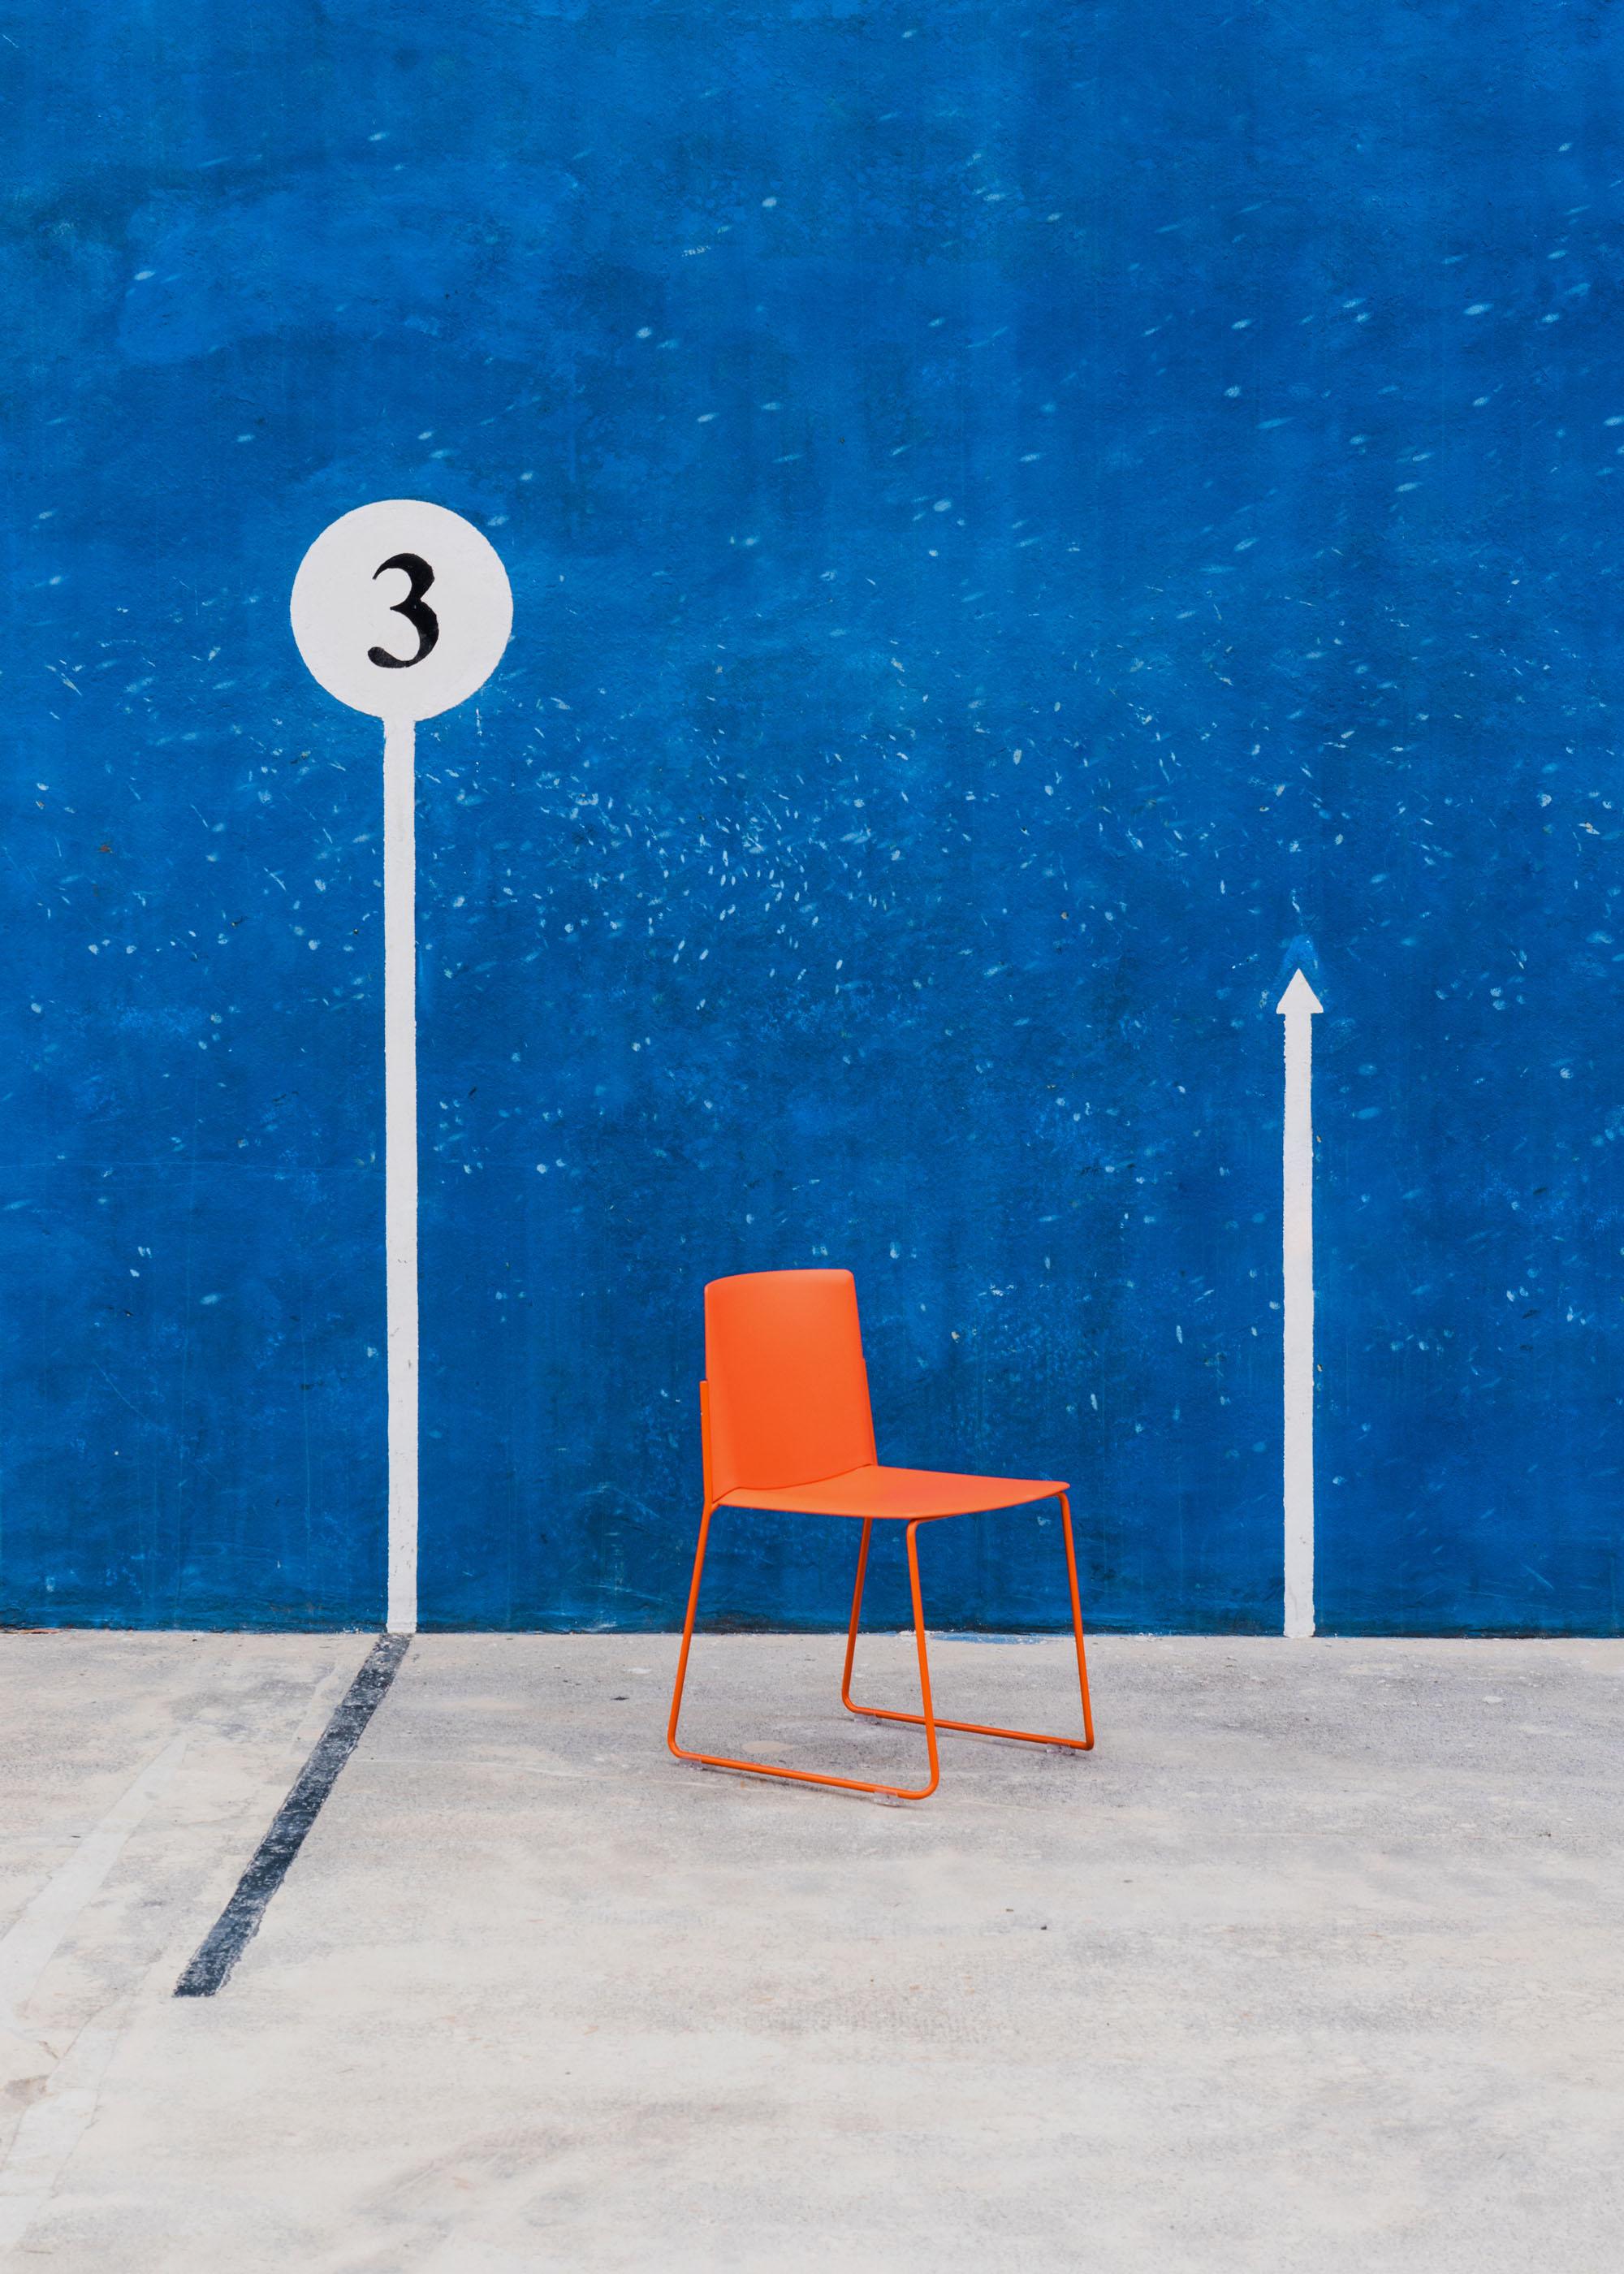 #furniture #enea #design #clase #basque #chairs #stilllife #fronton #blue #orange